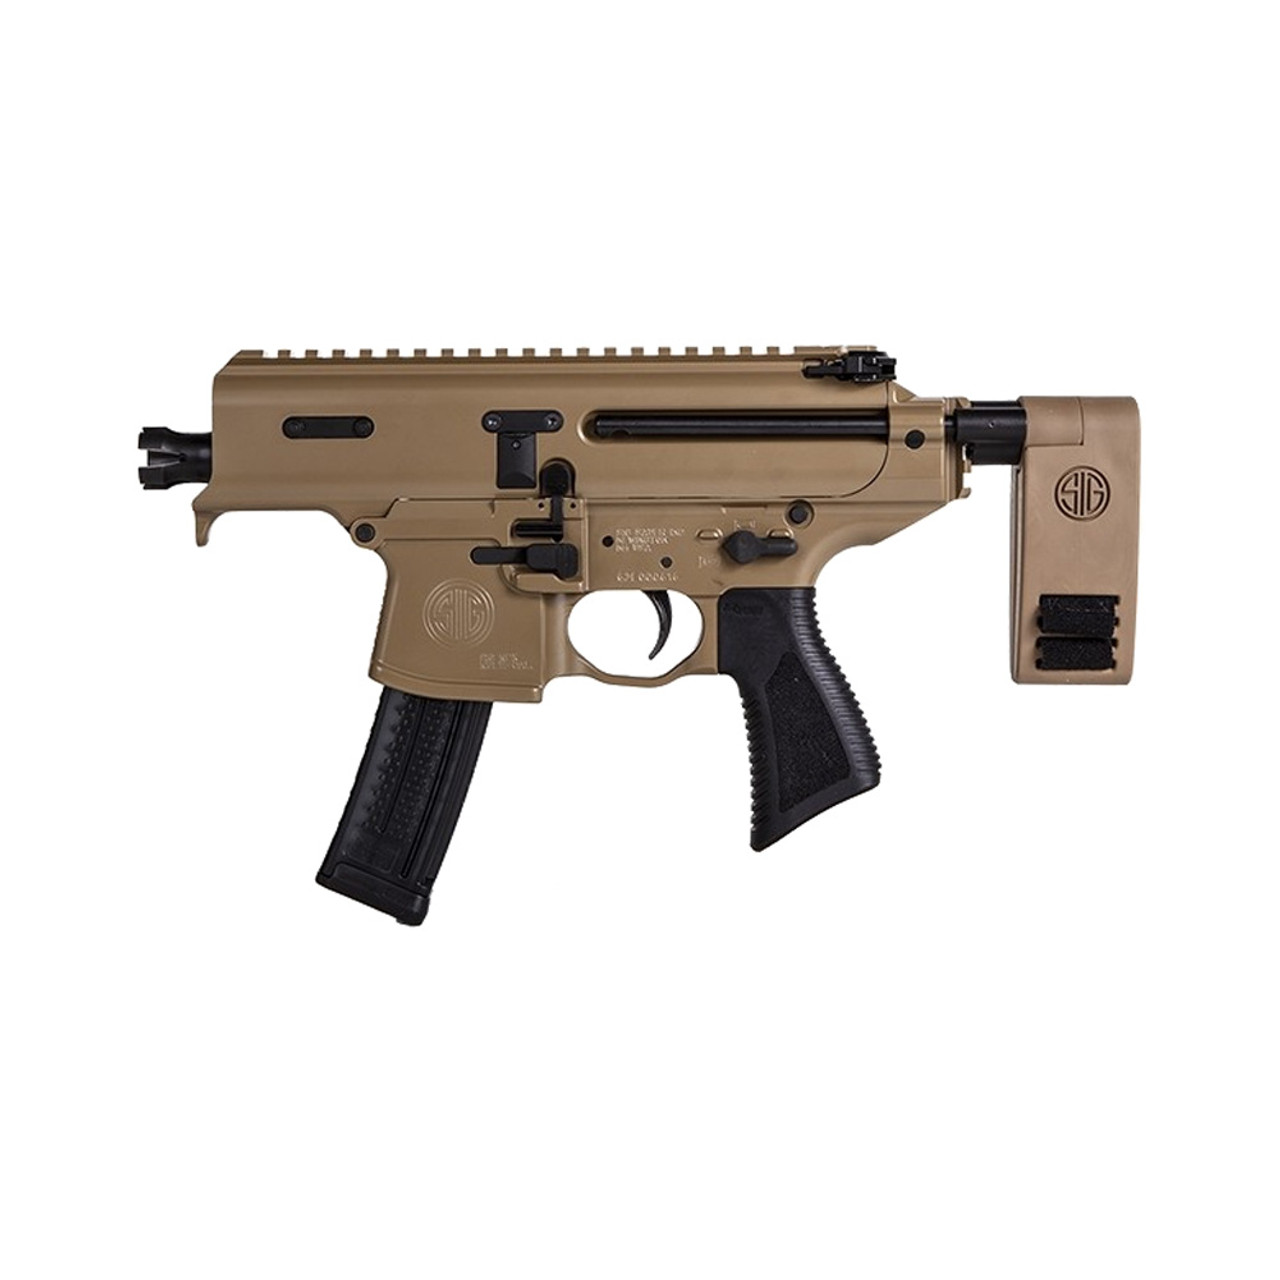 SIG SAUER SIG MPX Copperhead 9mm 3 5in 20Rd Cerakote Pistol (PMPX-3B-CH)